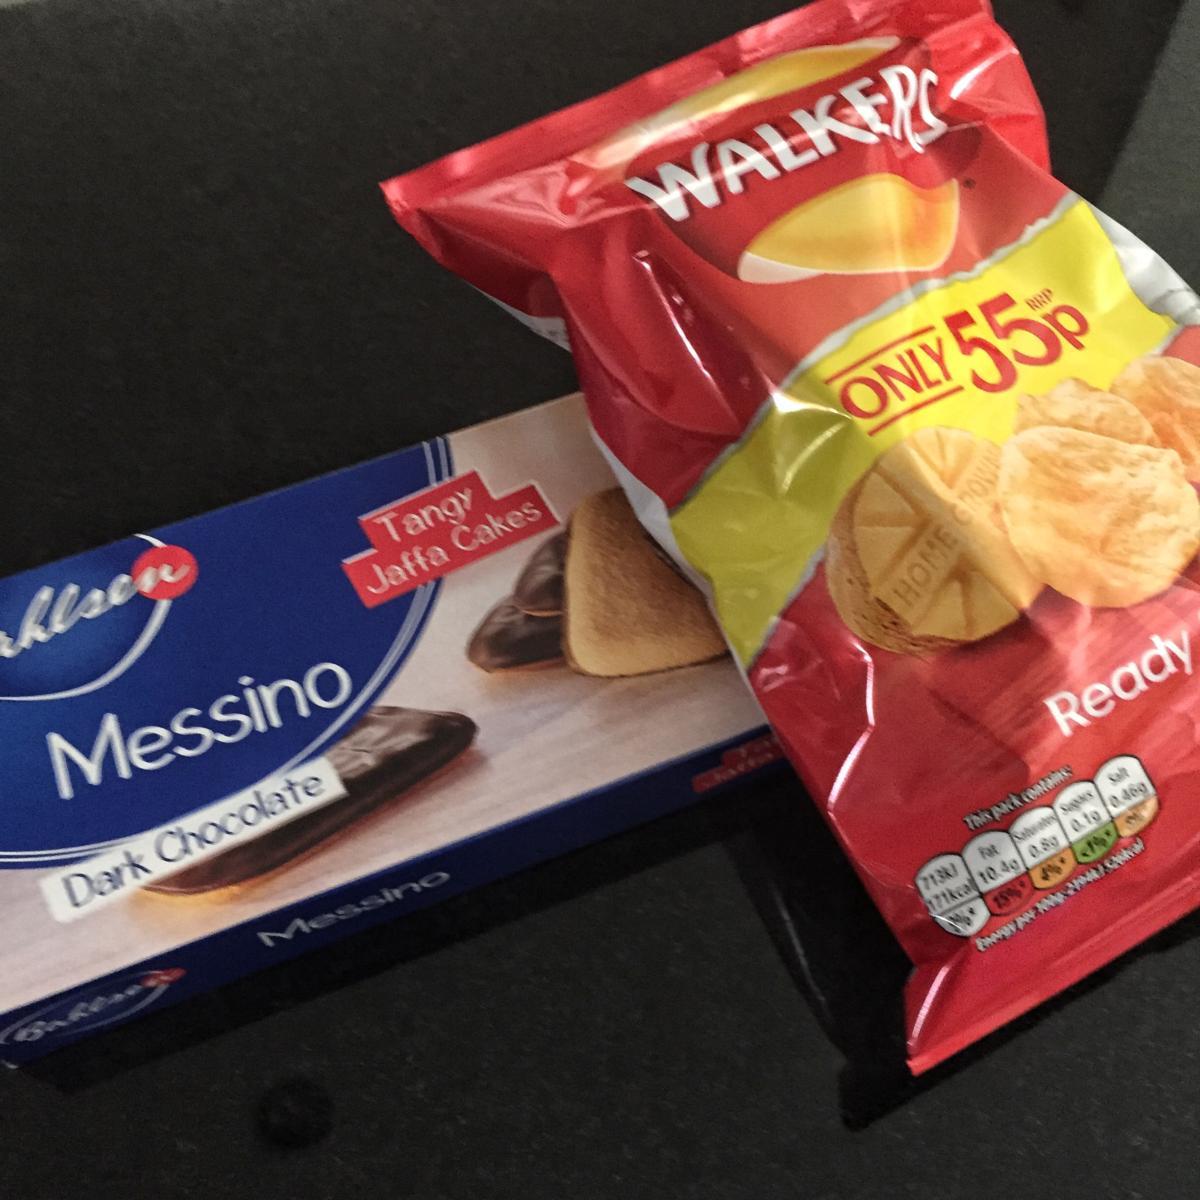 image - jaffa cakes and crisps